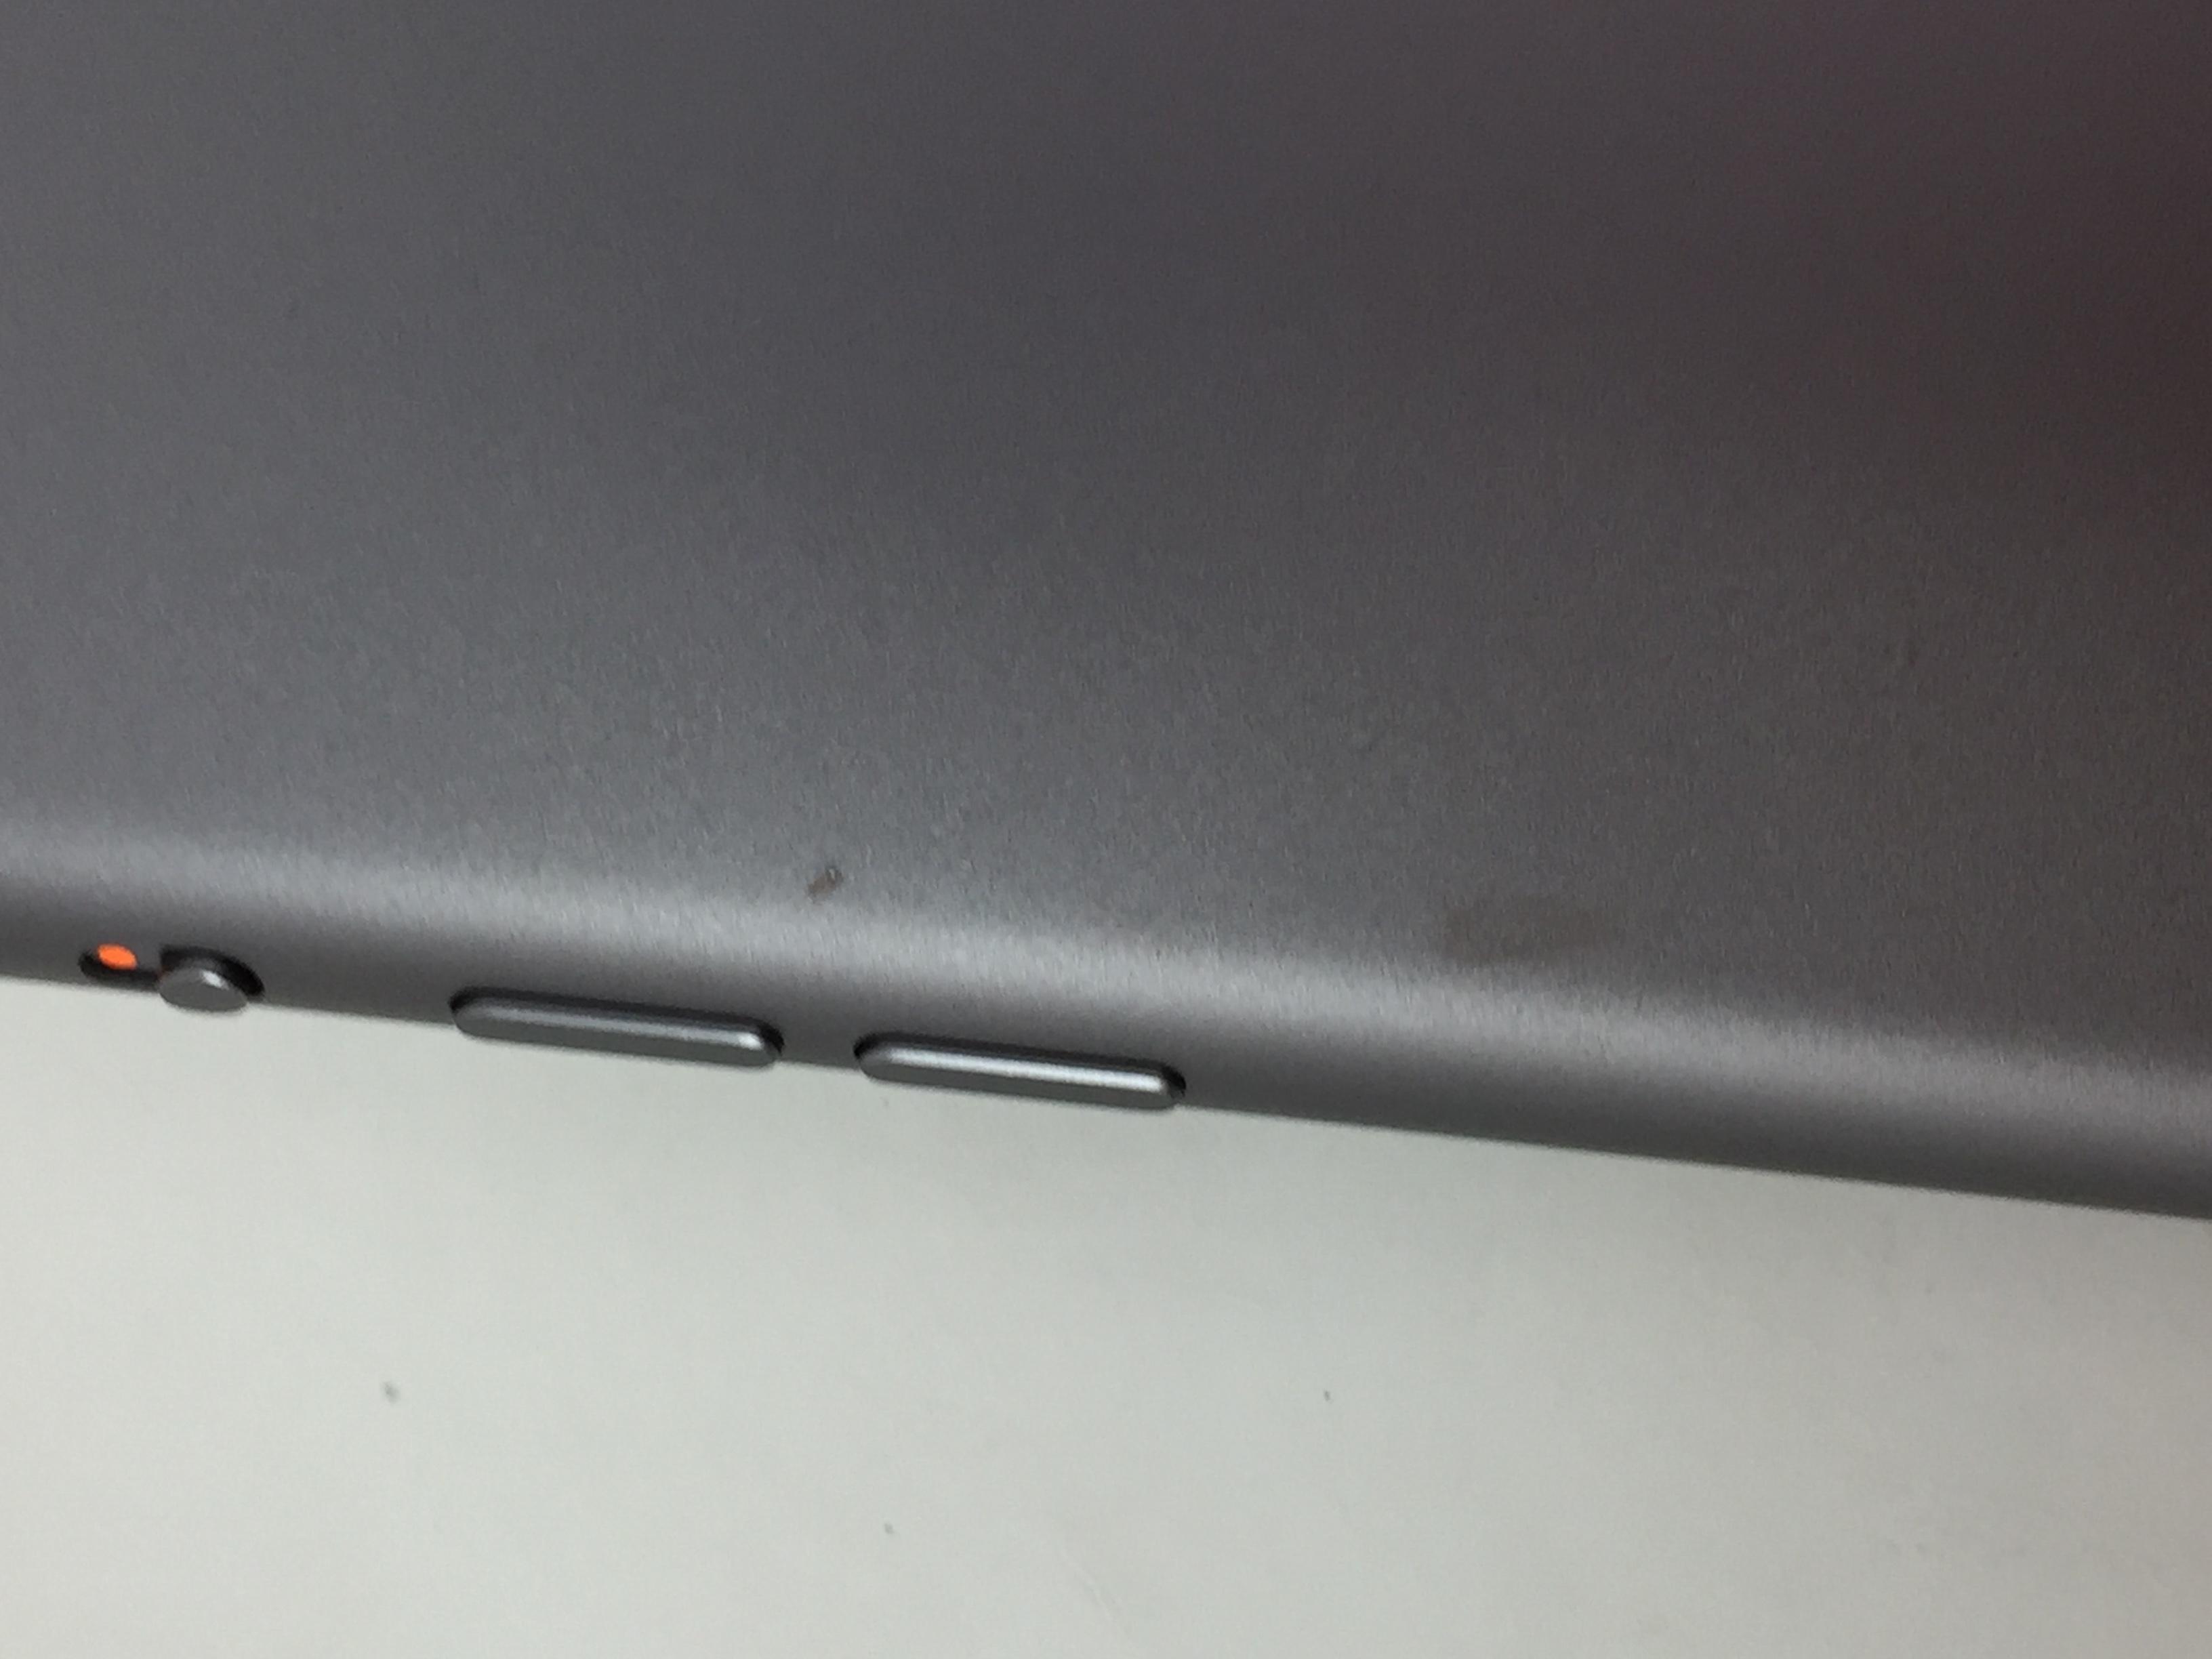 iPad Air Wi-Fi + Cellular 32GB, 32 GB, Gray, imagen 3